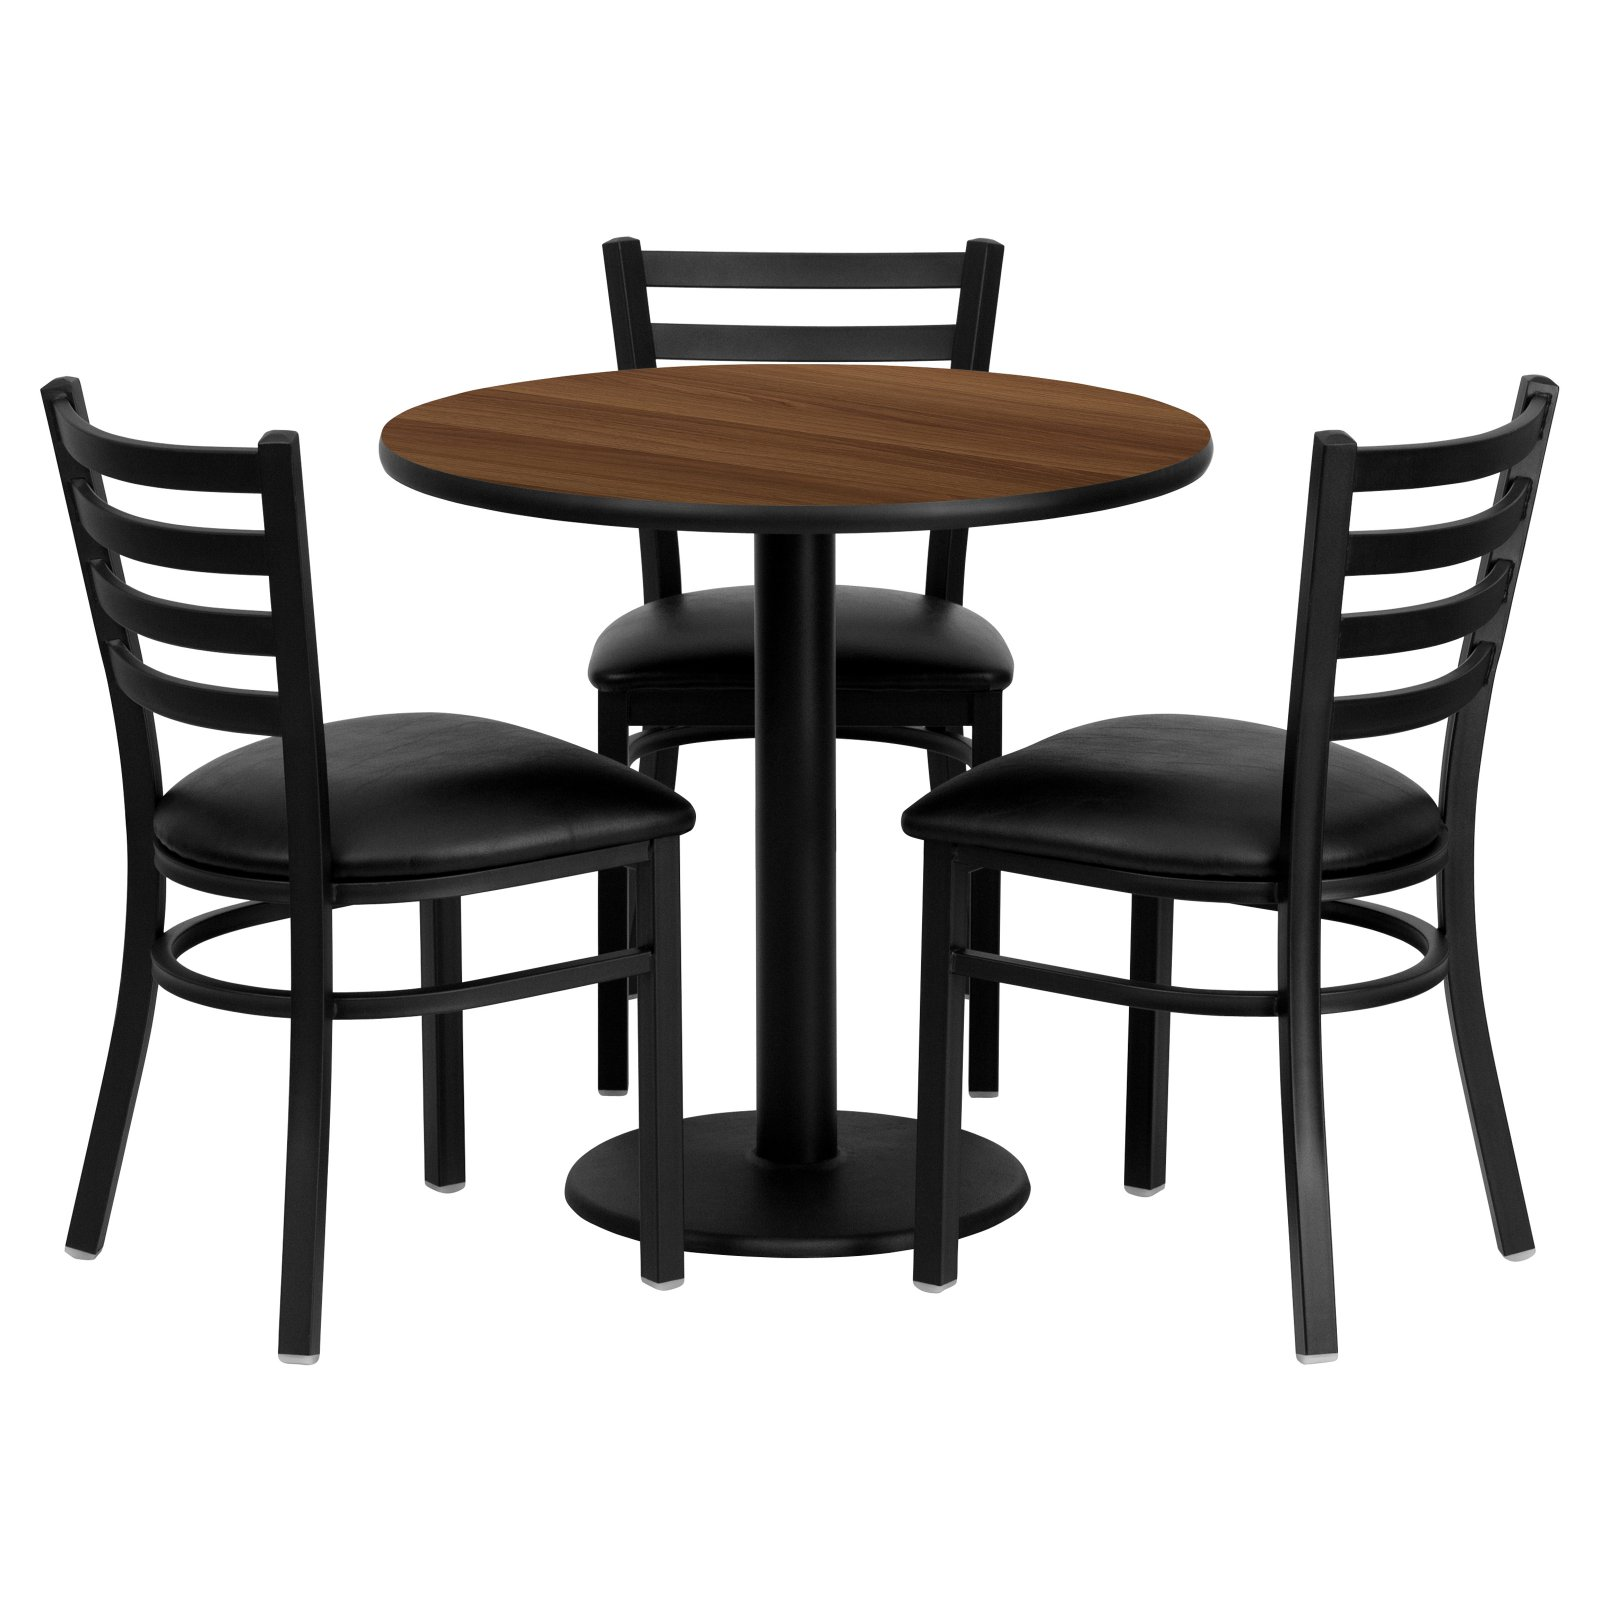 Flash Furniture 30'' Round Walnut Laminate Table Set with 3 Ladder Back Metal Chairs, Black Vinyl Seat